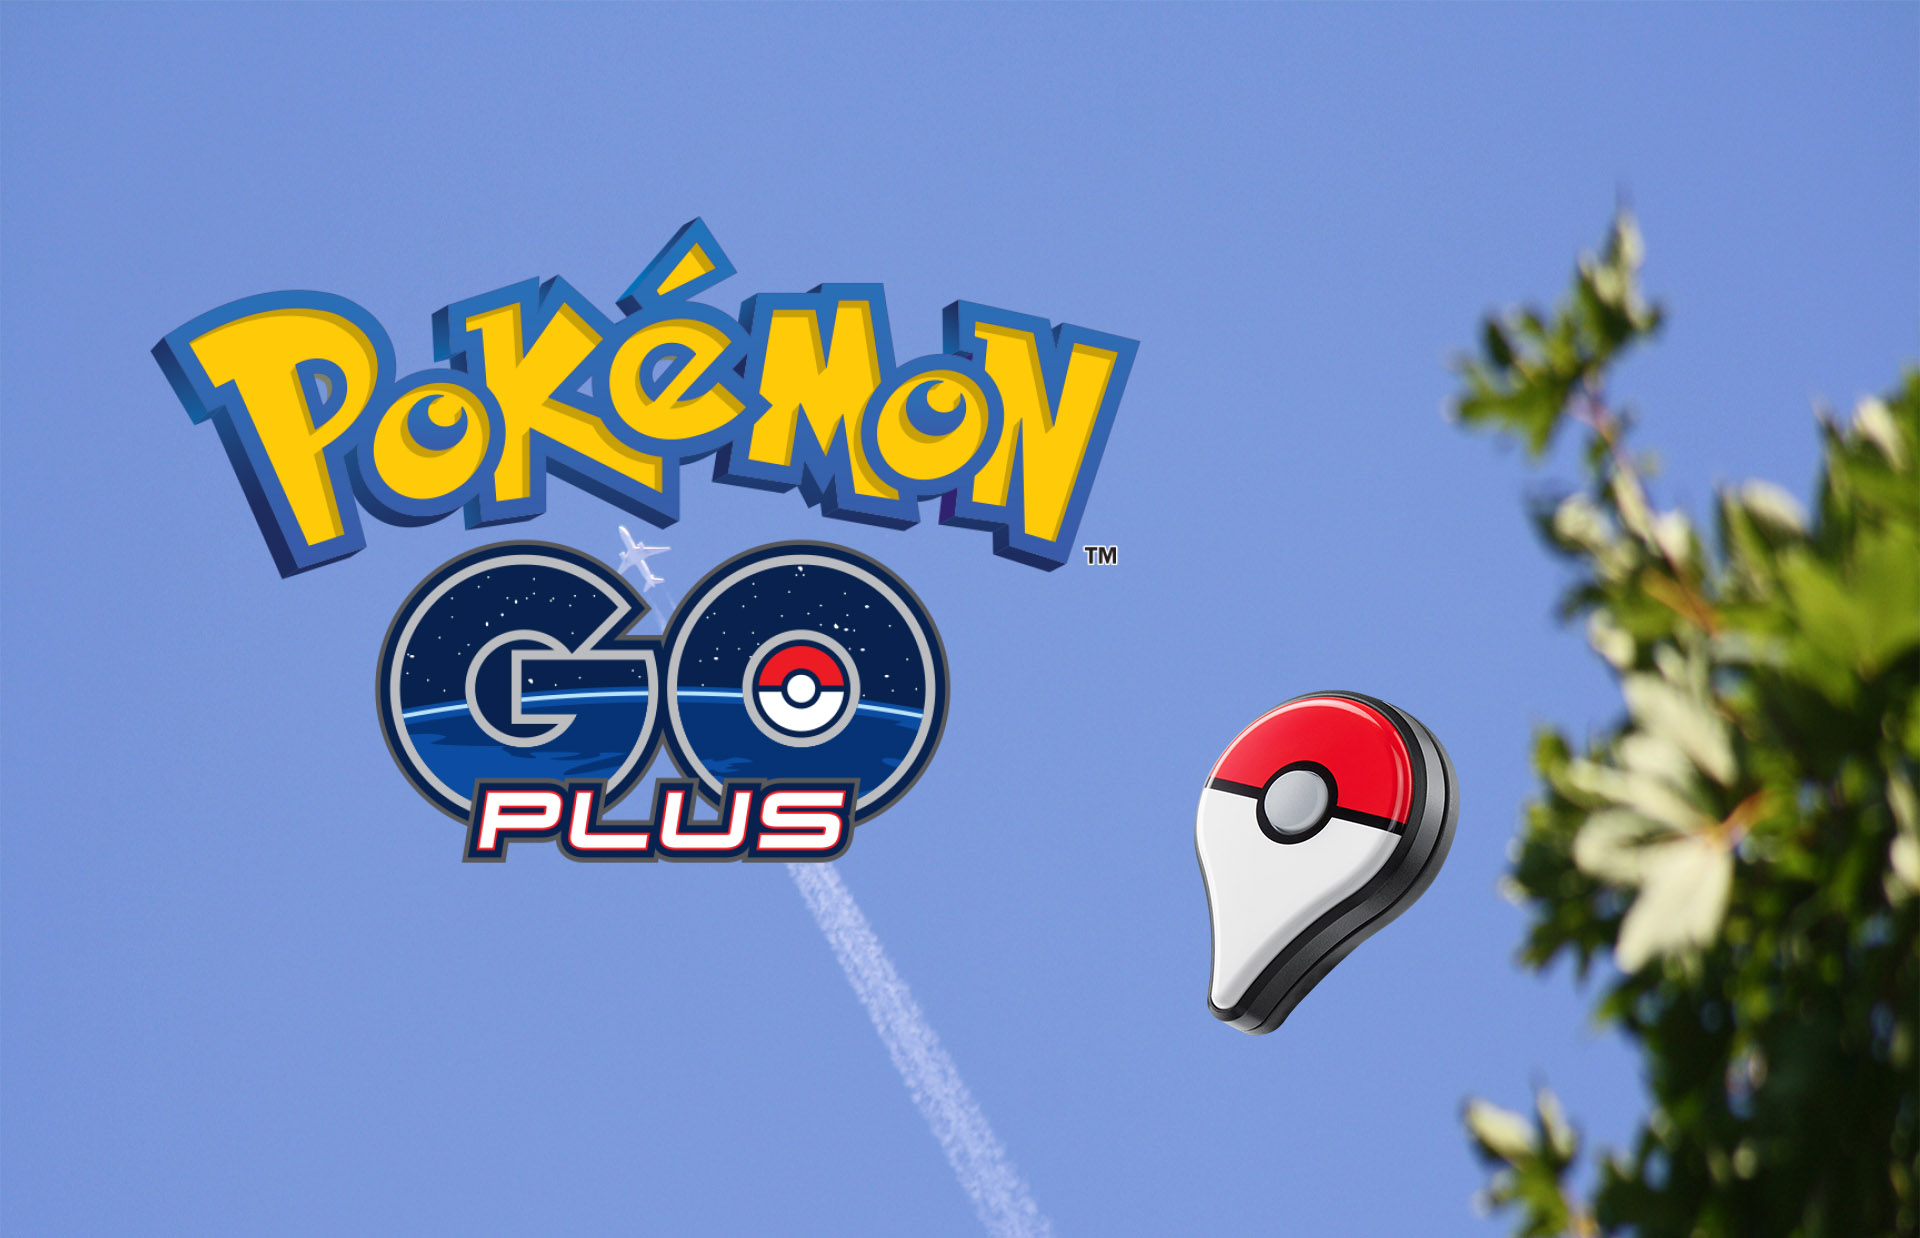 Pokémon GO Gadget anhänger